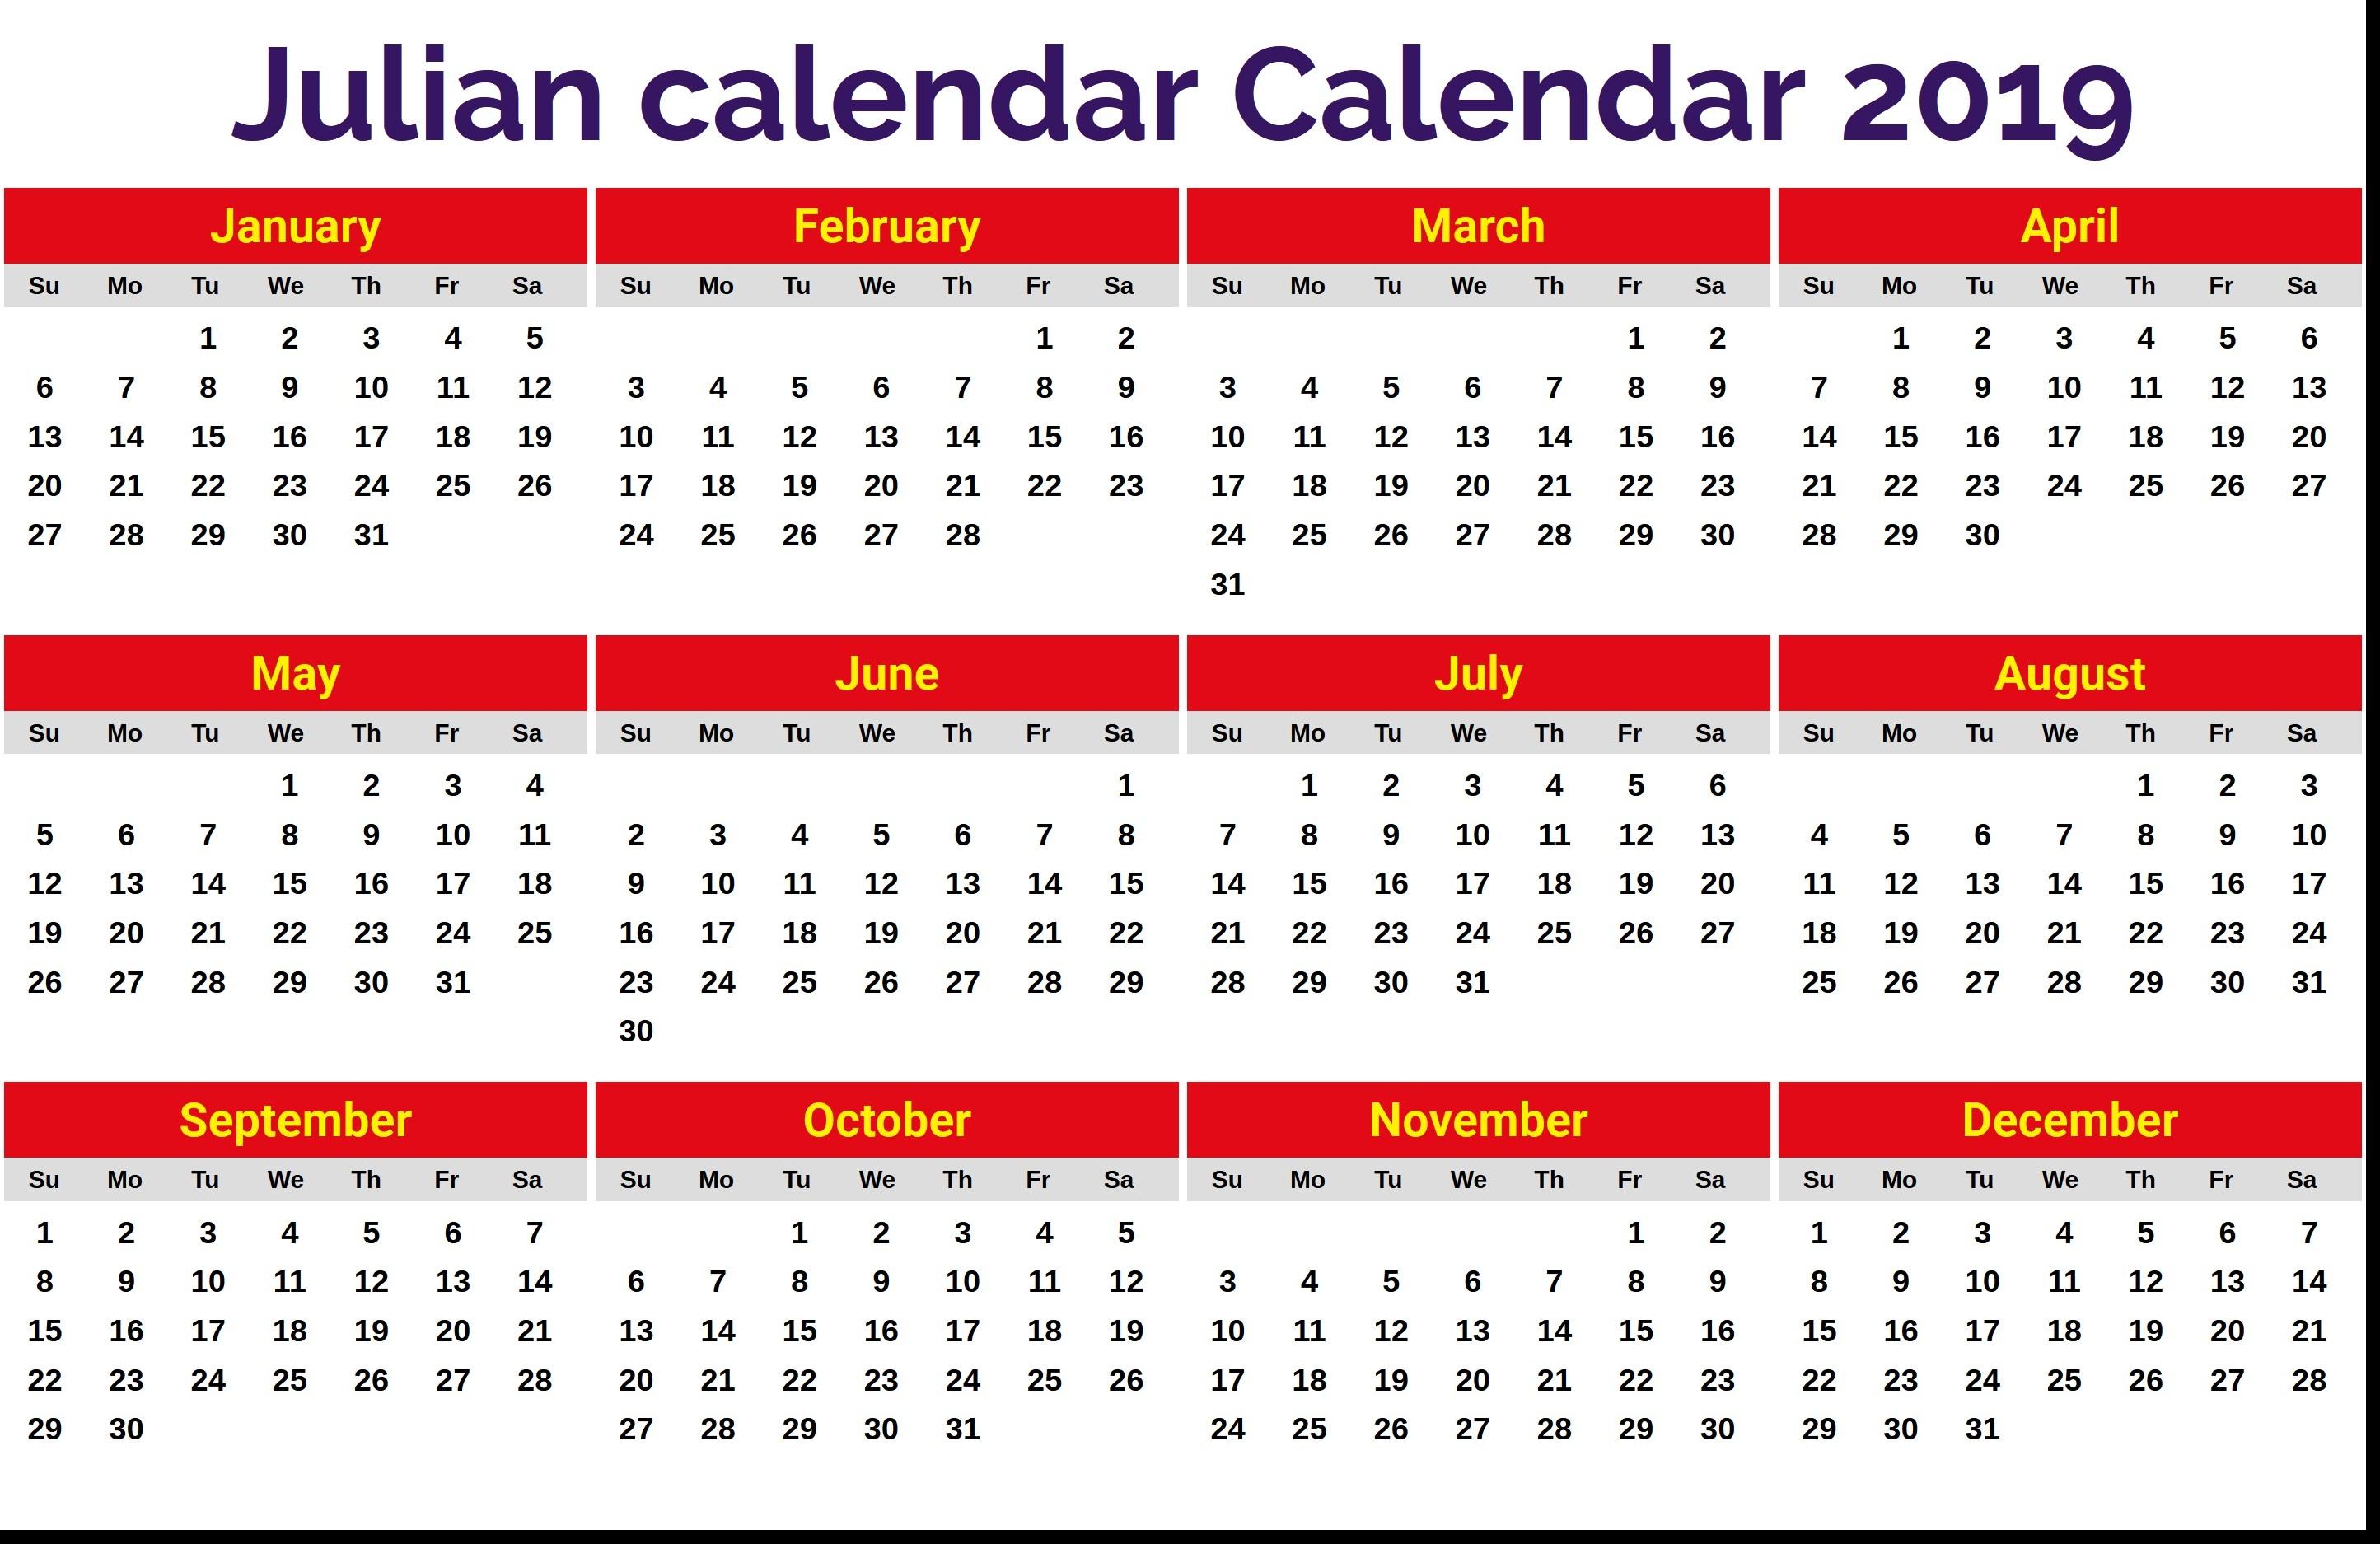 2019 Julian Date Calendar Printable Julian Calendar 2019